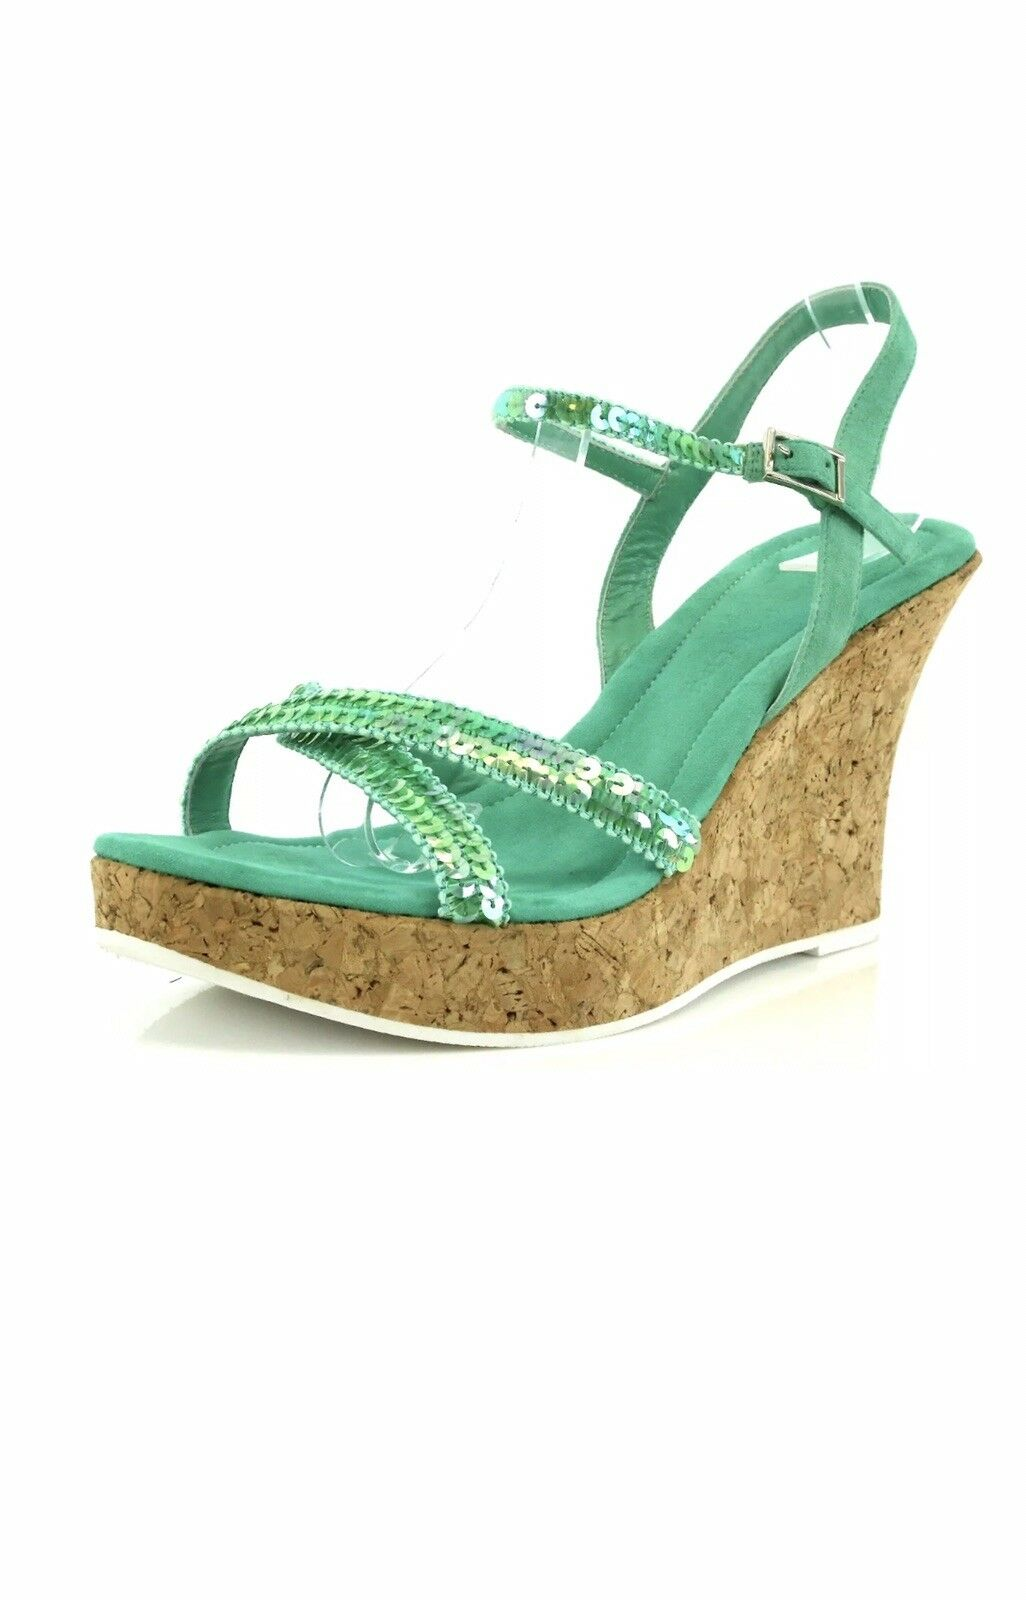 Studio Pollini ARMA Green Suede Wedge Sandals Size 40.5 EU NEW